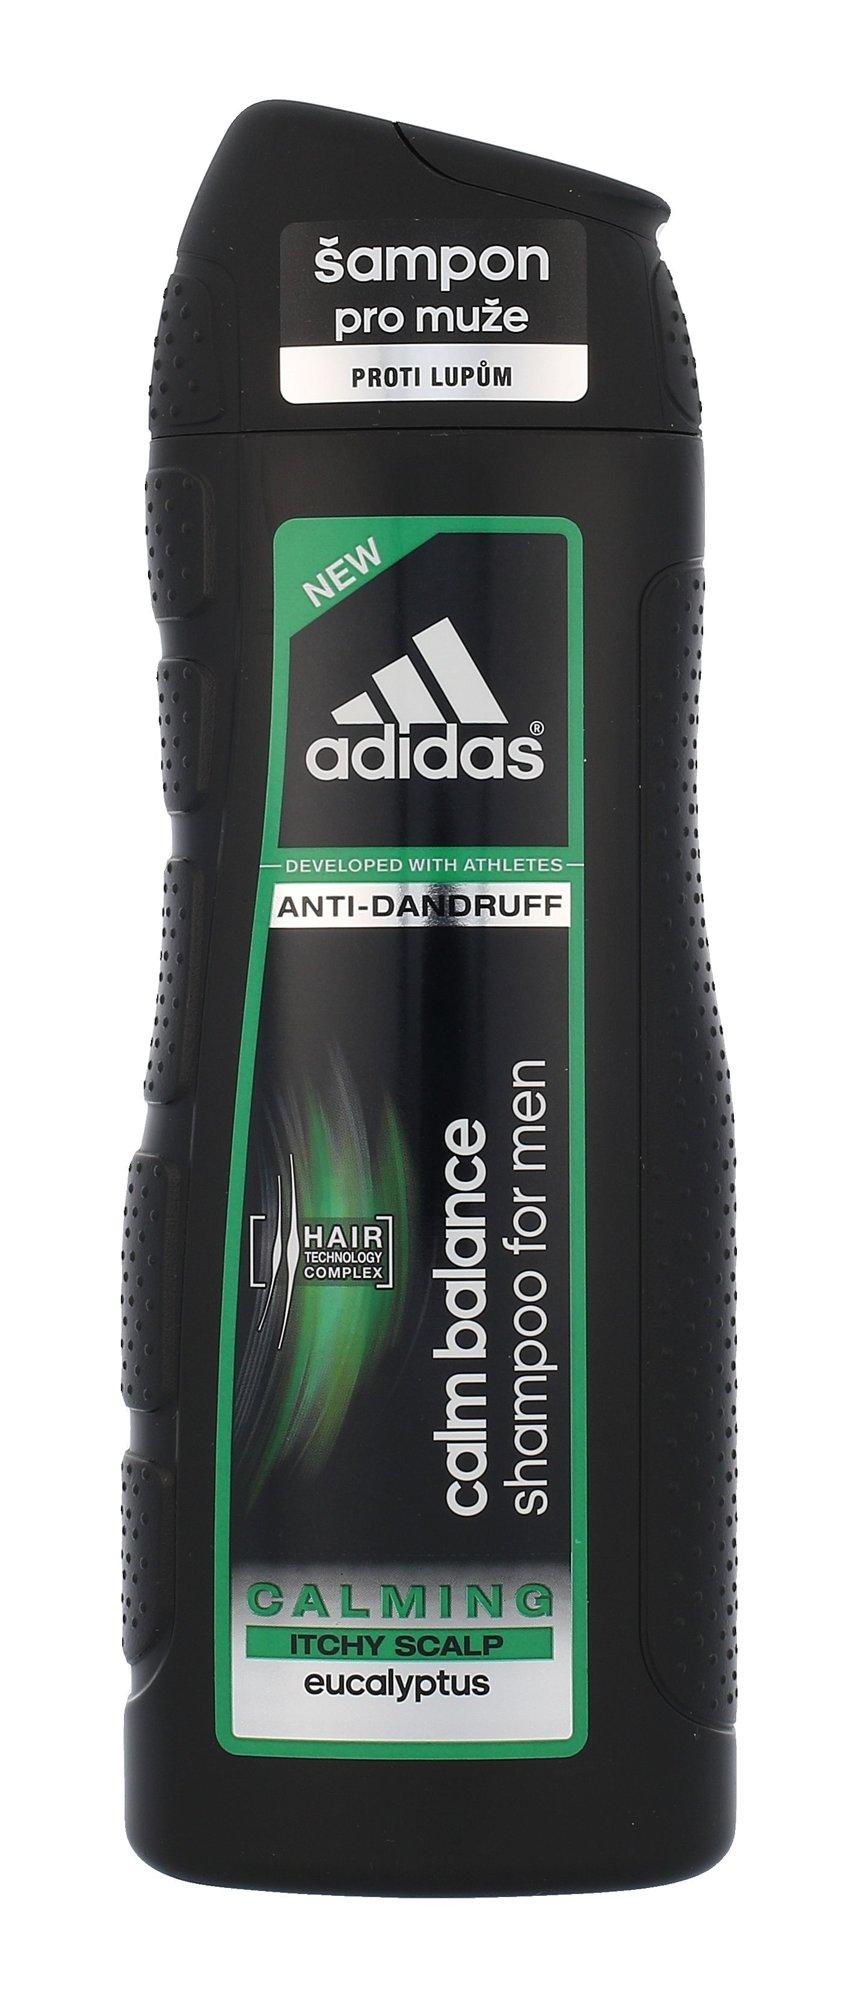 Adidas Calm Balance Shampoo 400ml